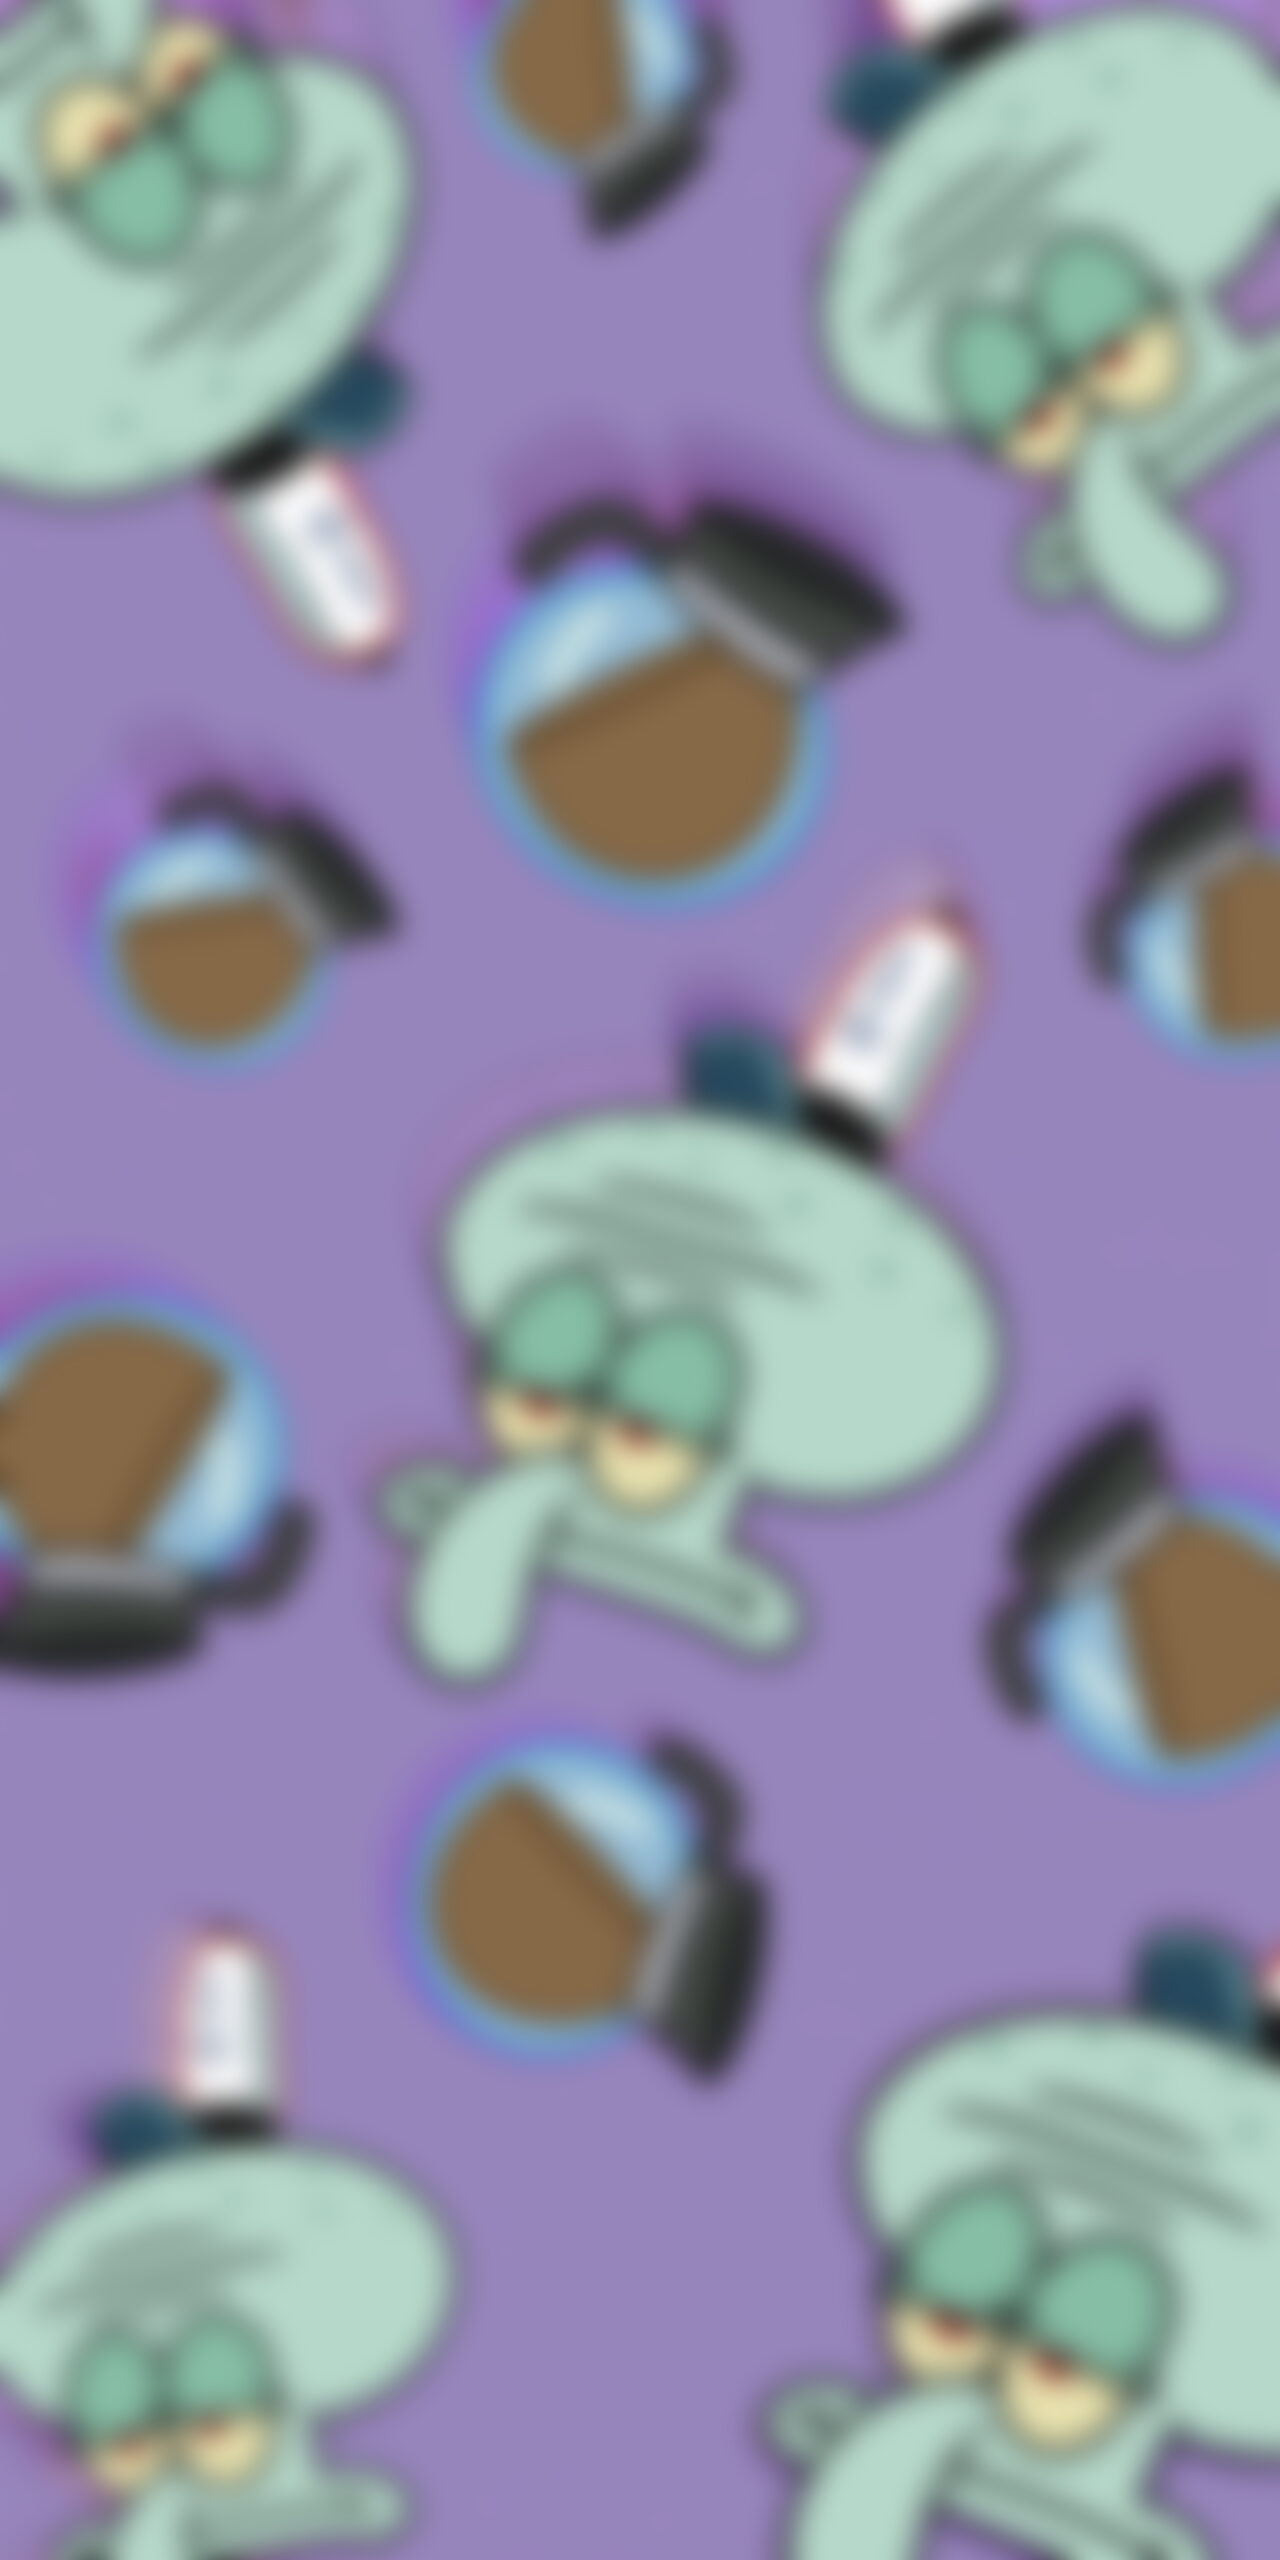 spongebob squidward monday vibes blur wallpaper